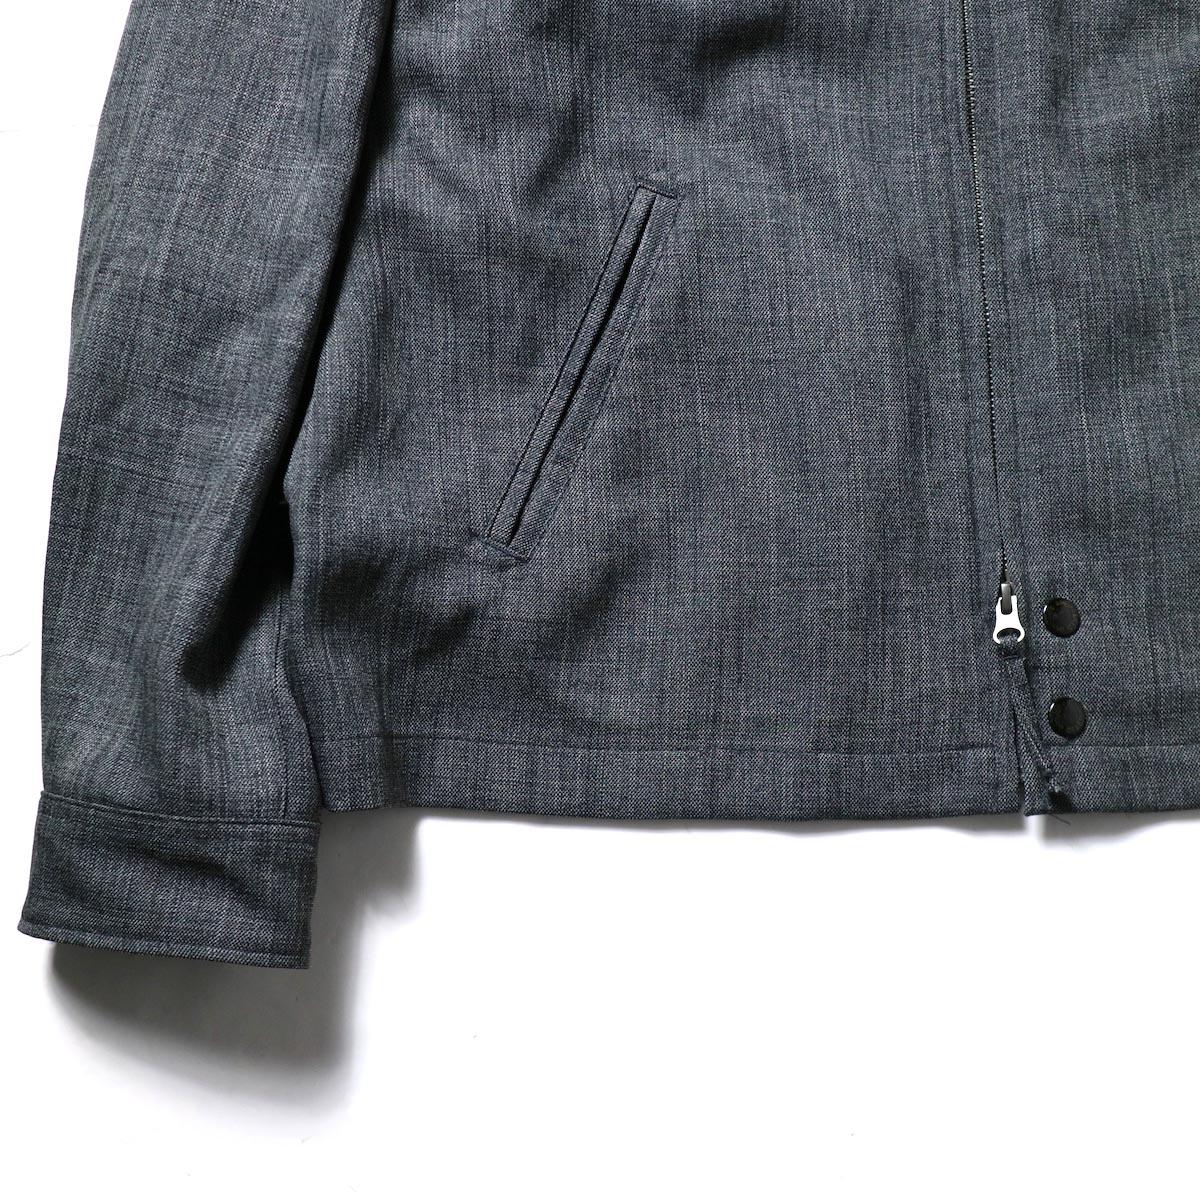 Engineered Garments / Claigton Jacket - Polyester Sharkskin (Charcoal)袖、裾